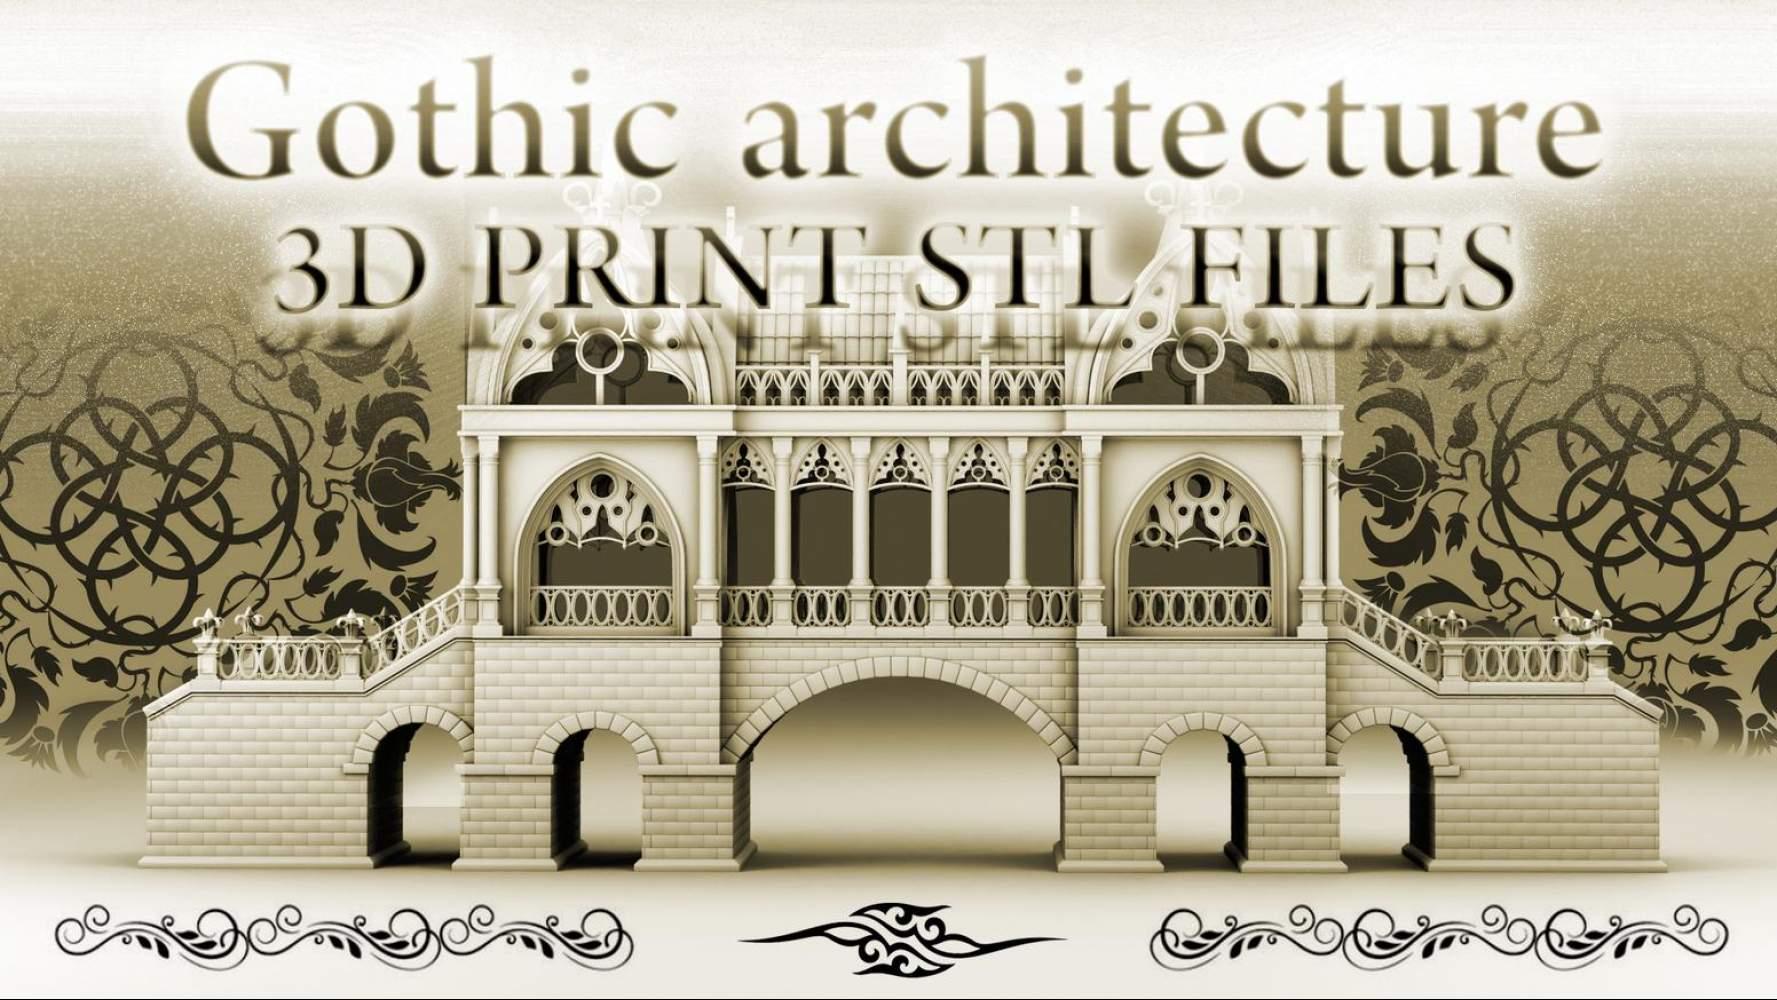 Gothic architecture's Cover